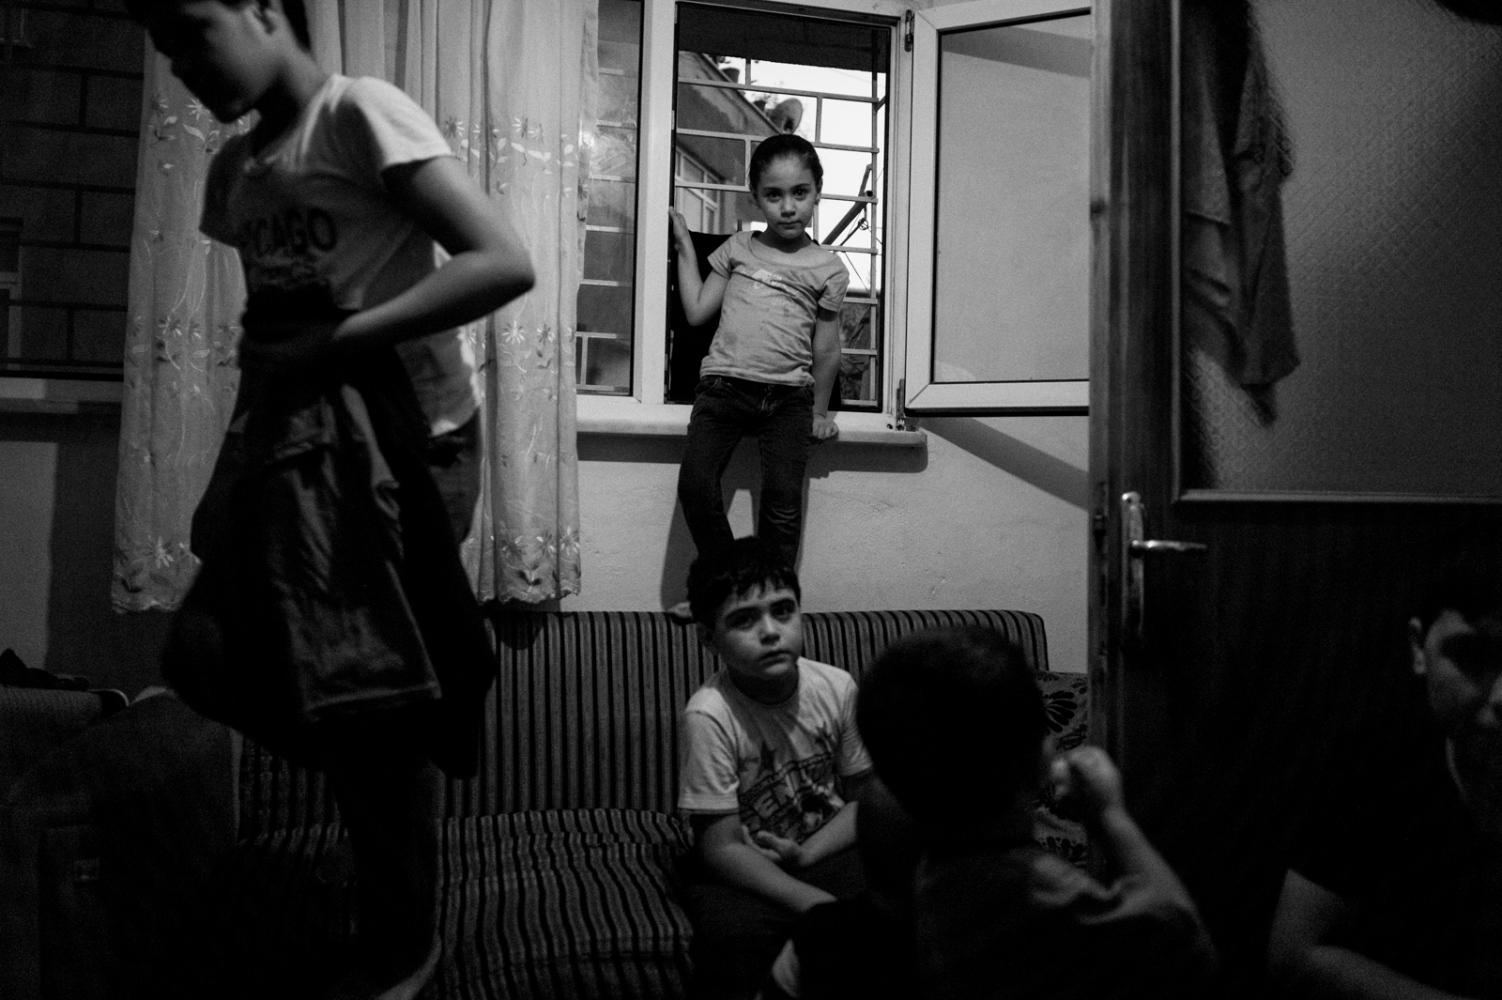 Art and Documentary Photography - Loading PascalVossen_UUU-26.jpg